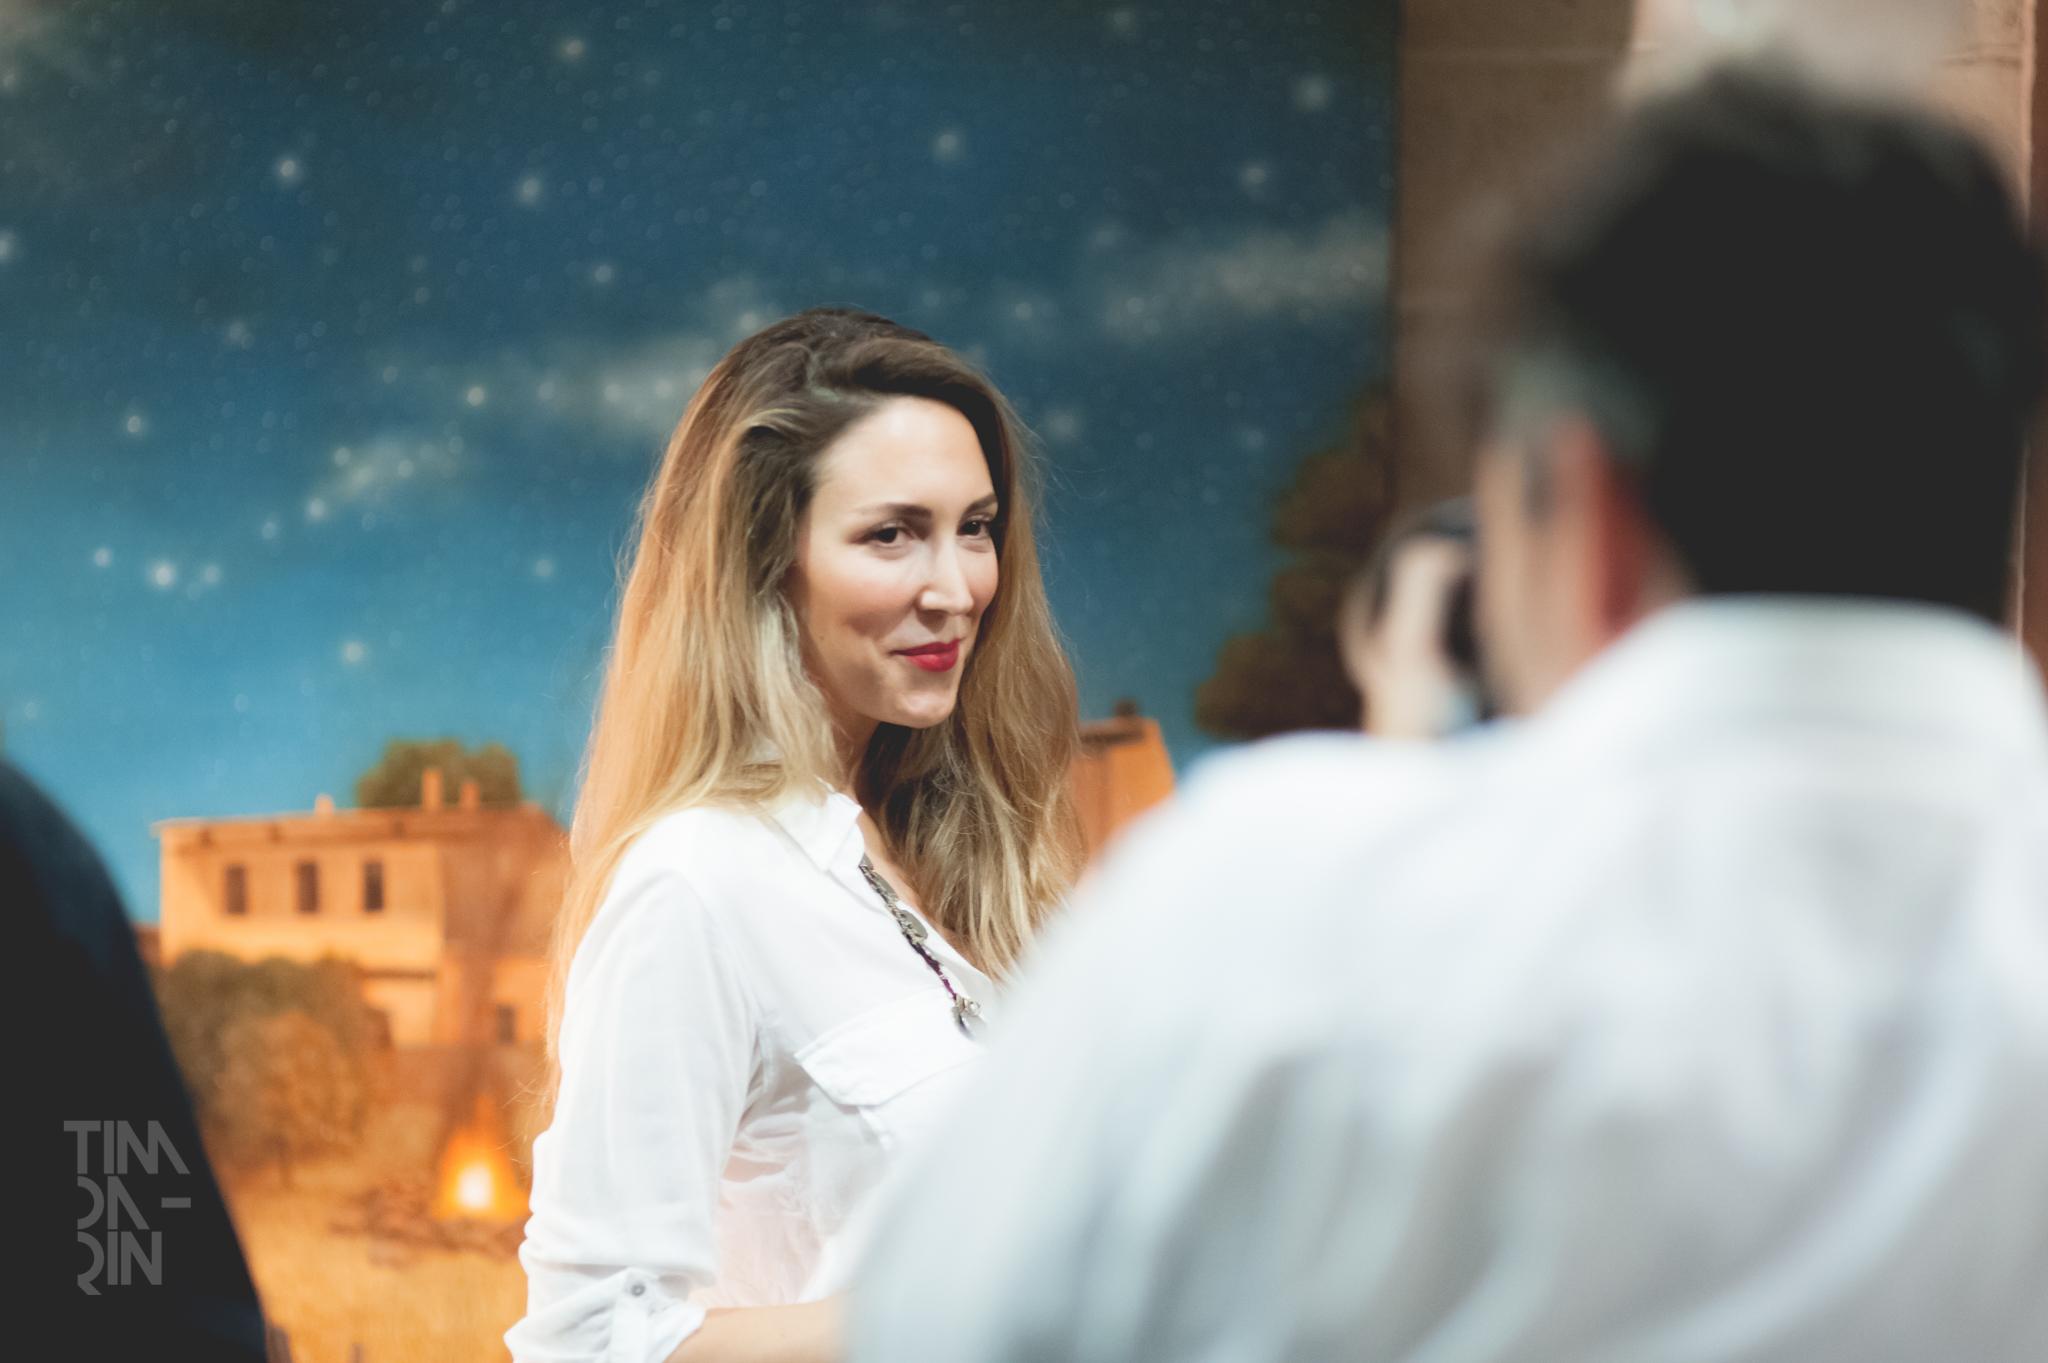 Lisa Camillo by TIM DA-RIN - 006 of 036 - _DSC5203 - 3 stars.jpg